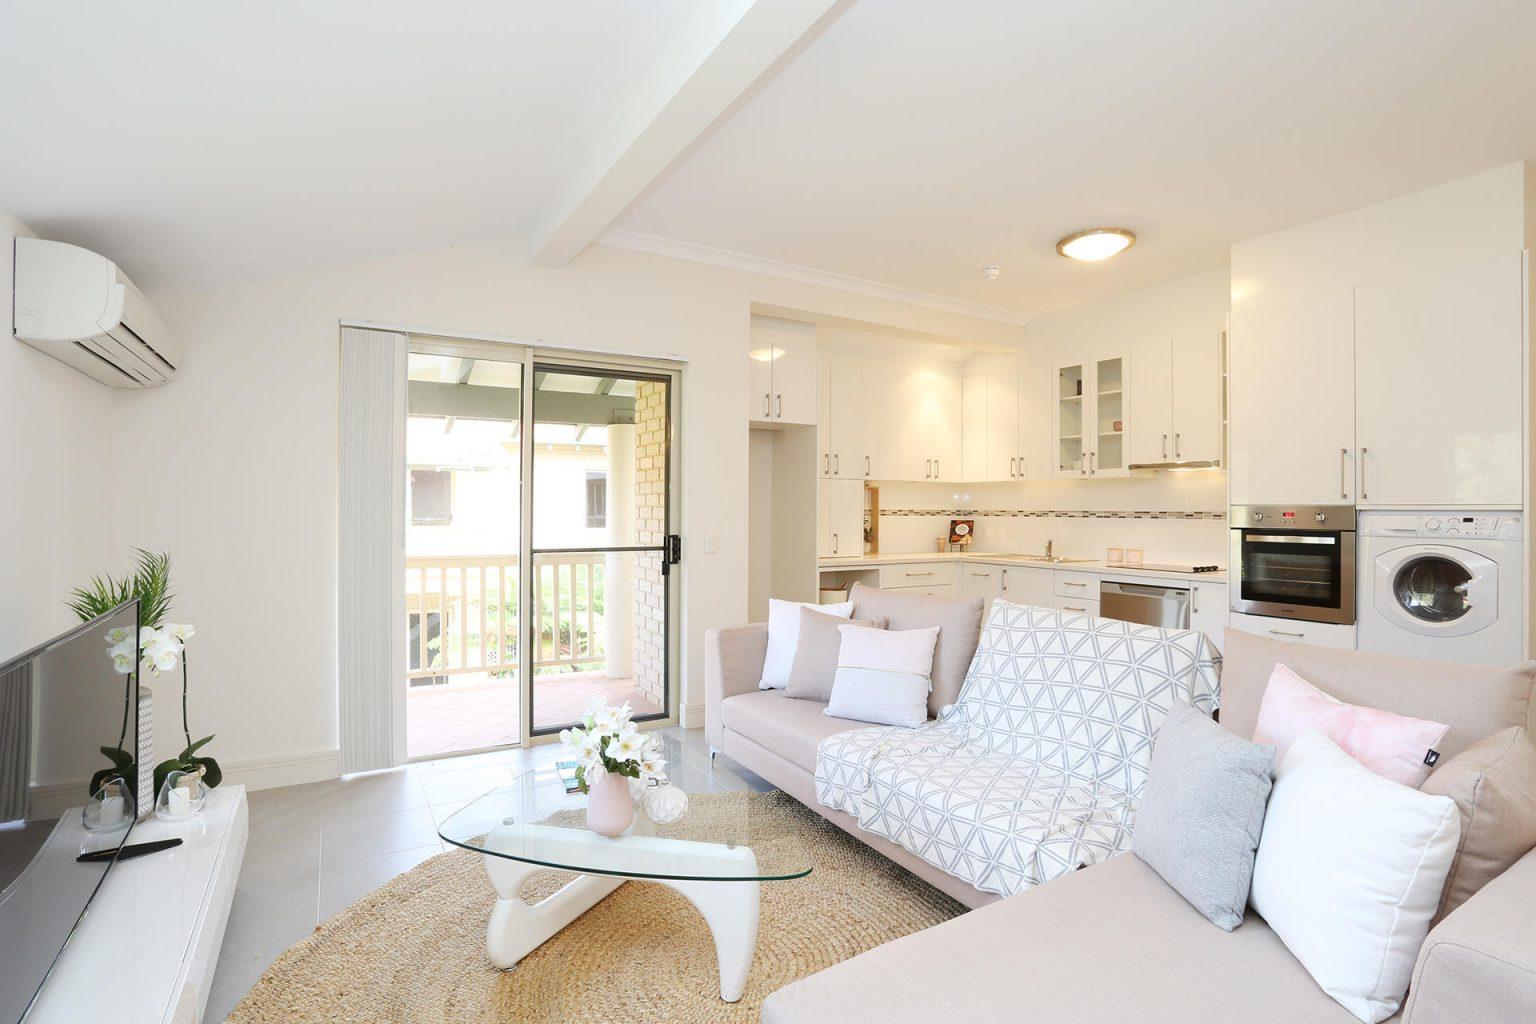 apartment 233 - retirement living city beach